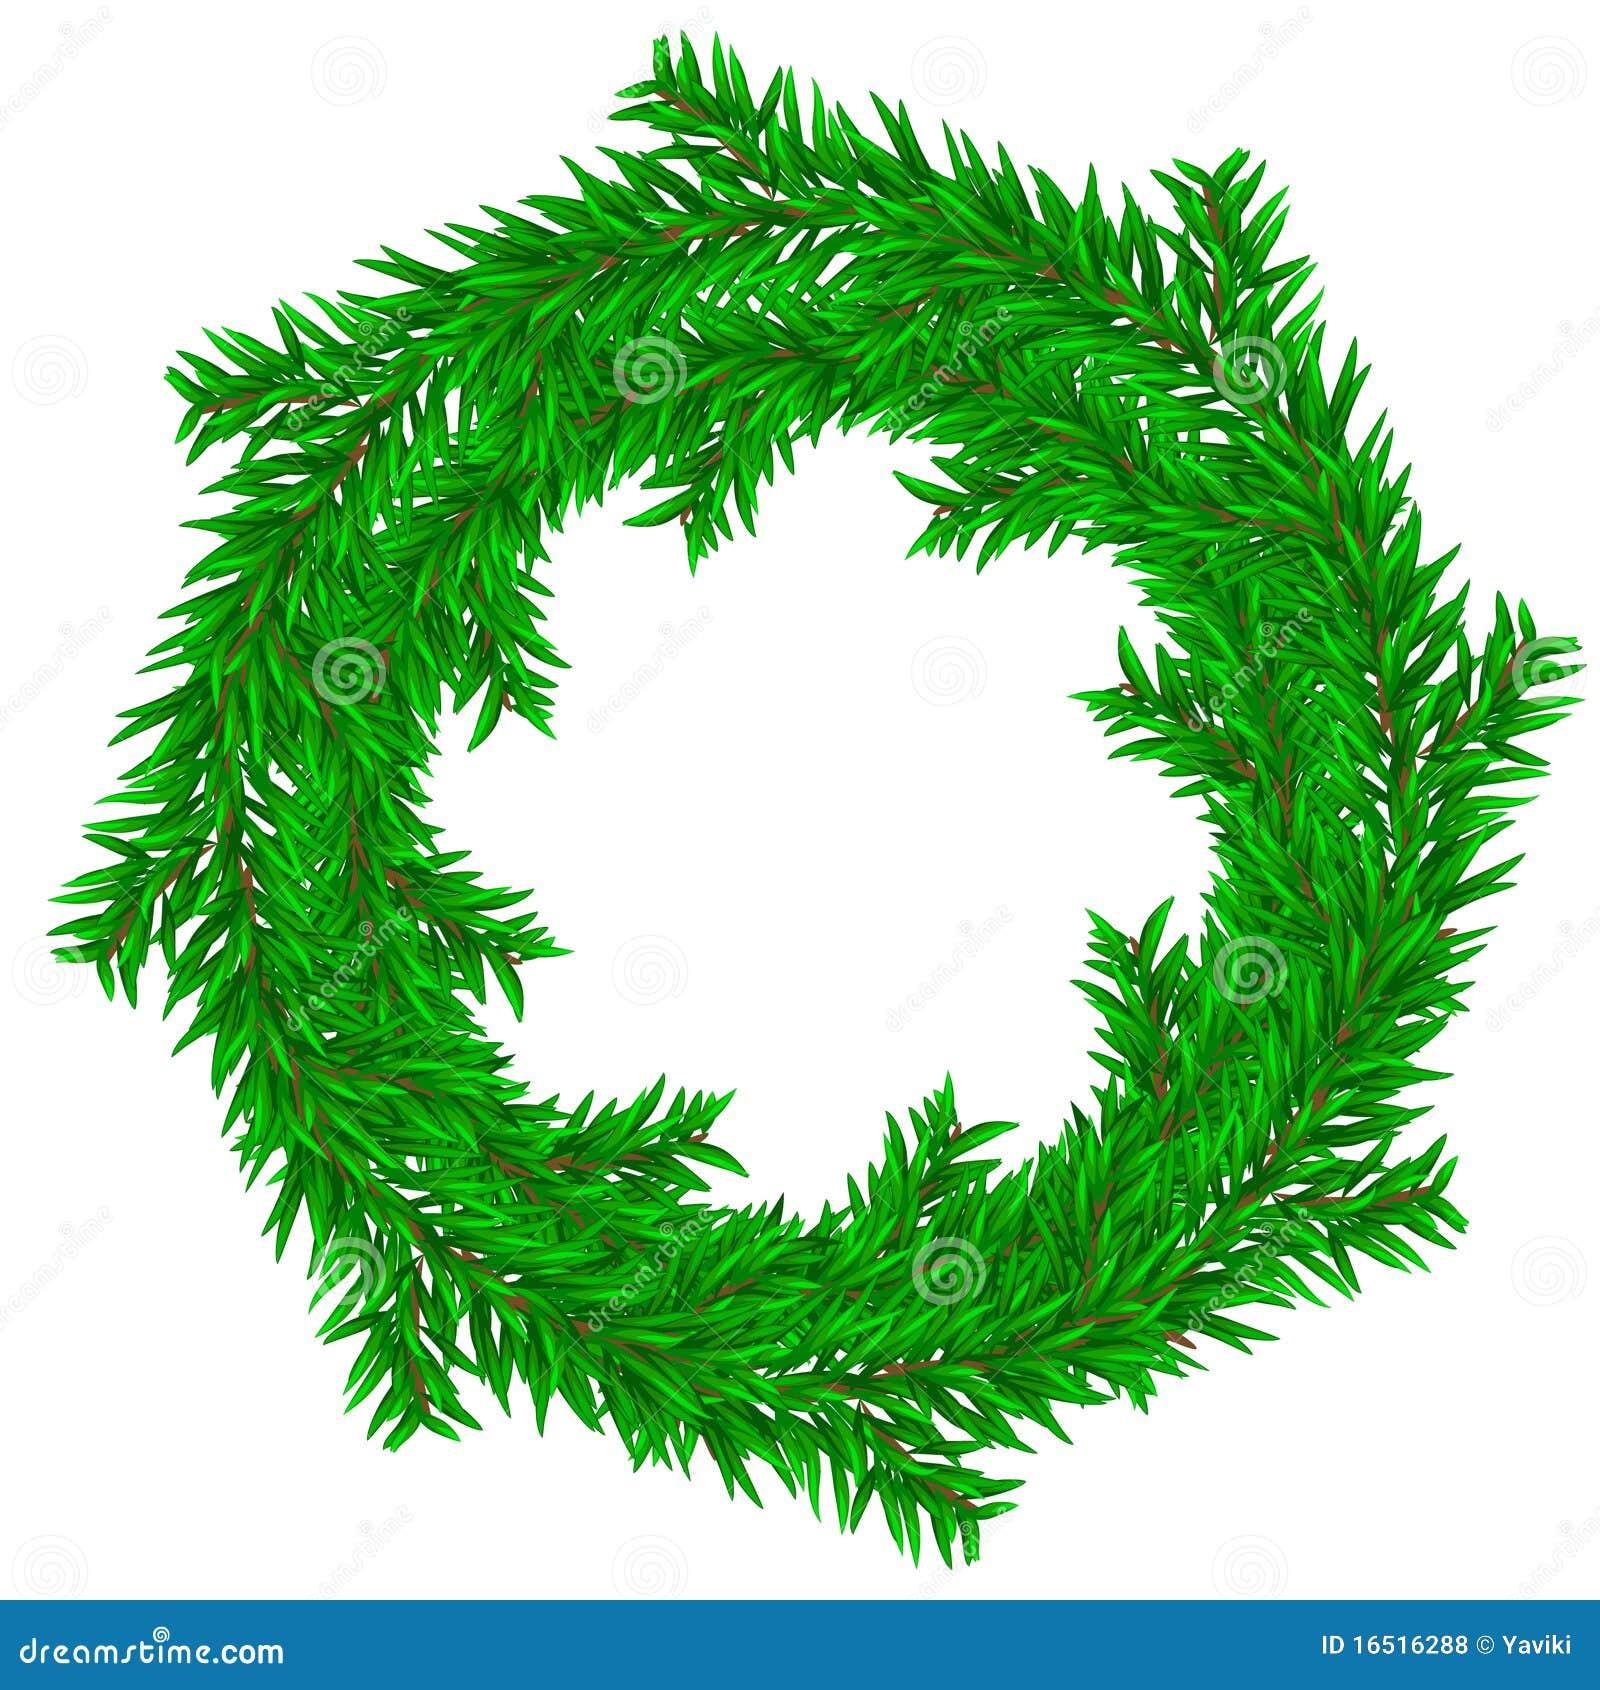 Cyber Monday Christmas Tree